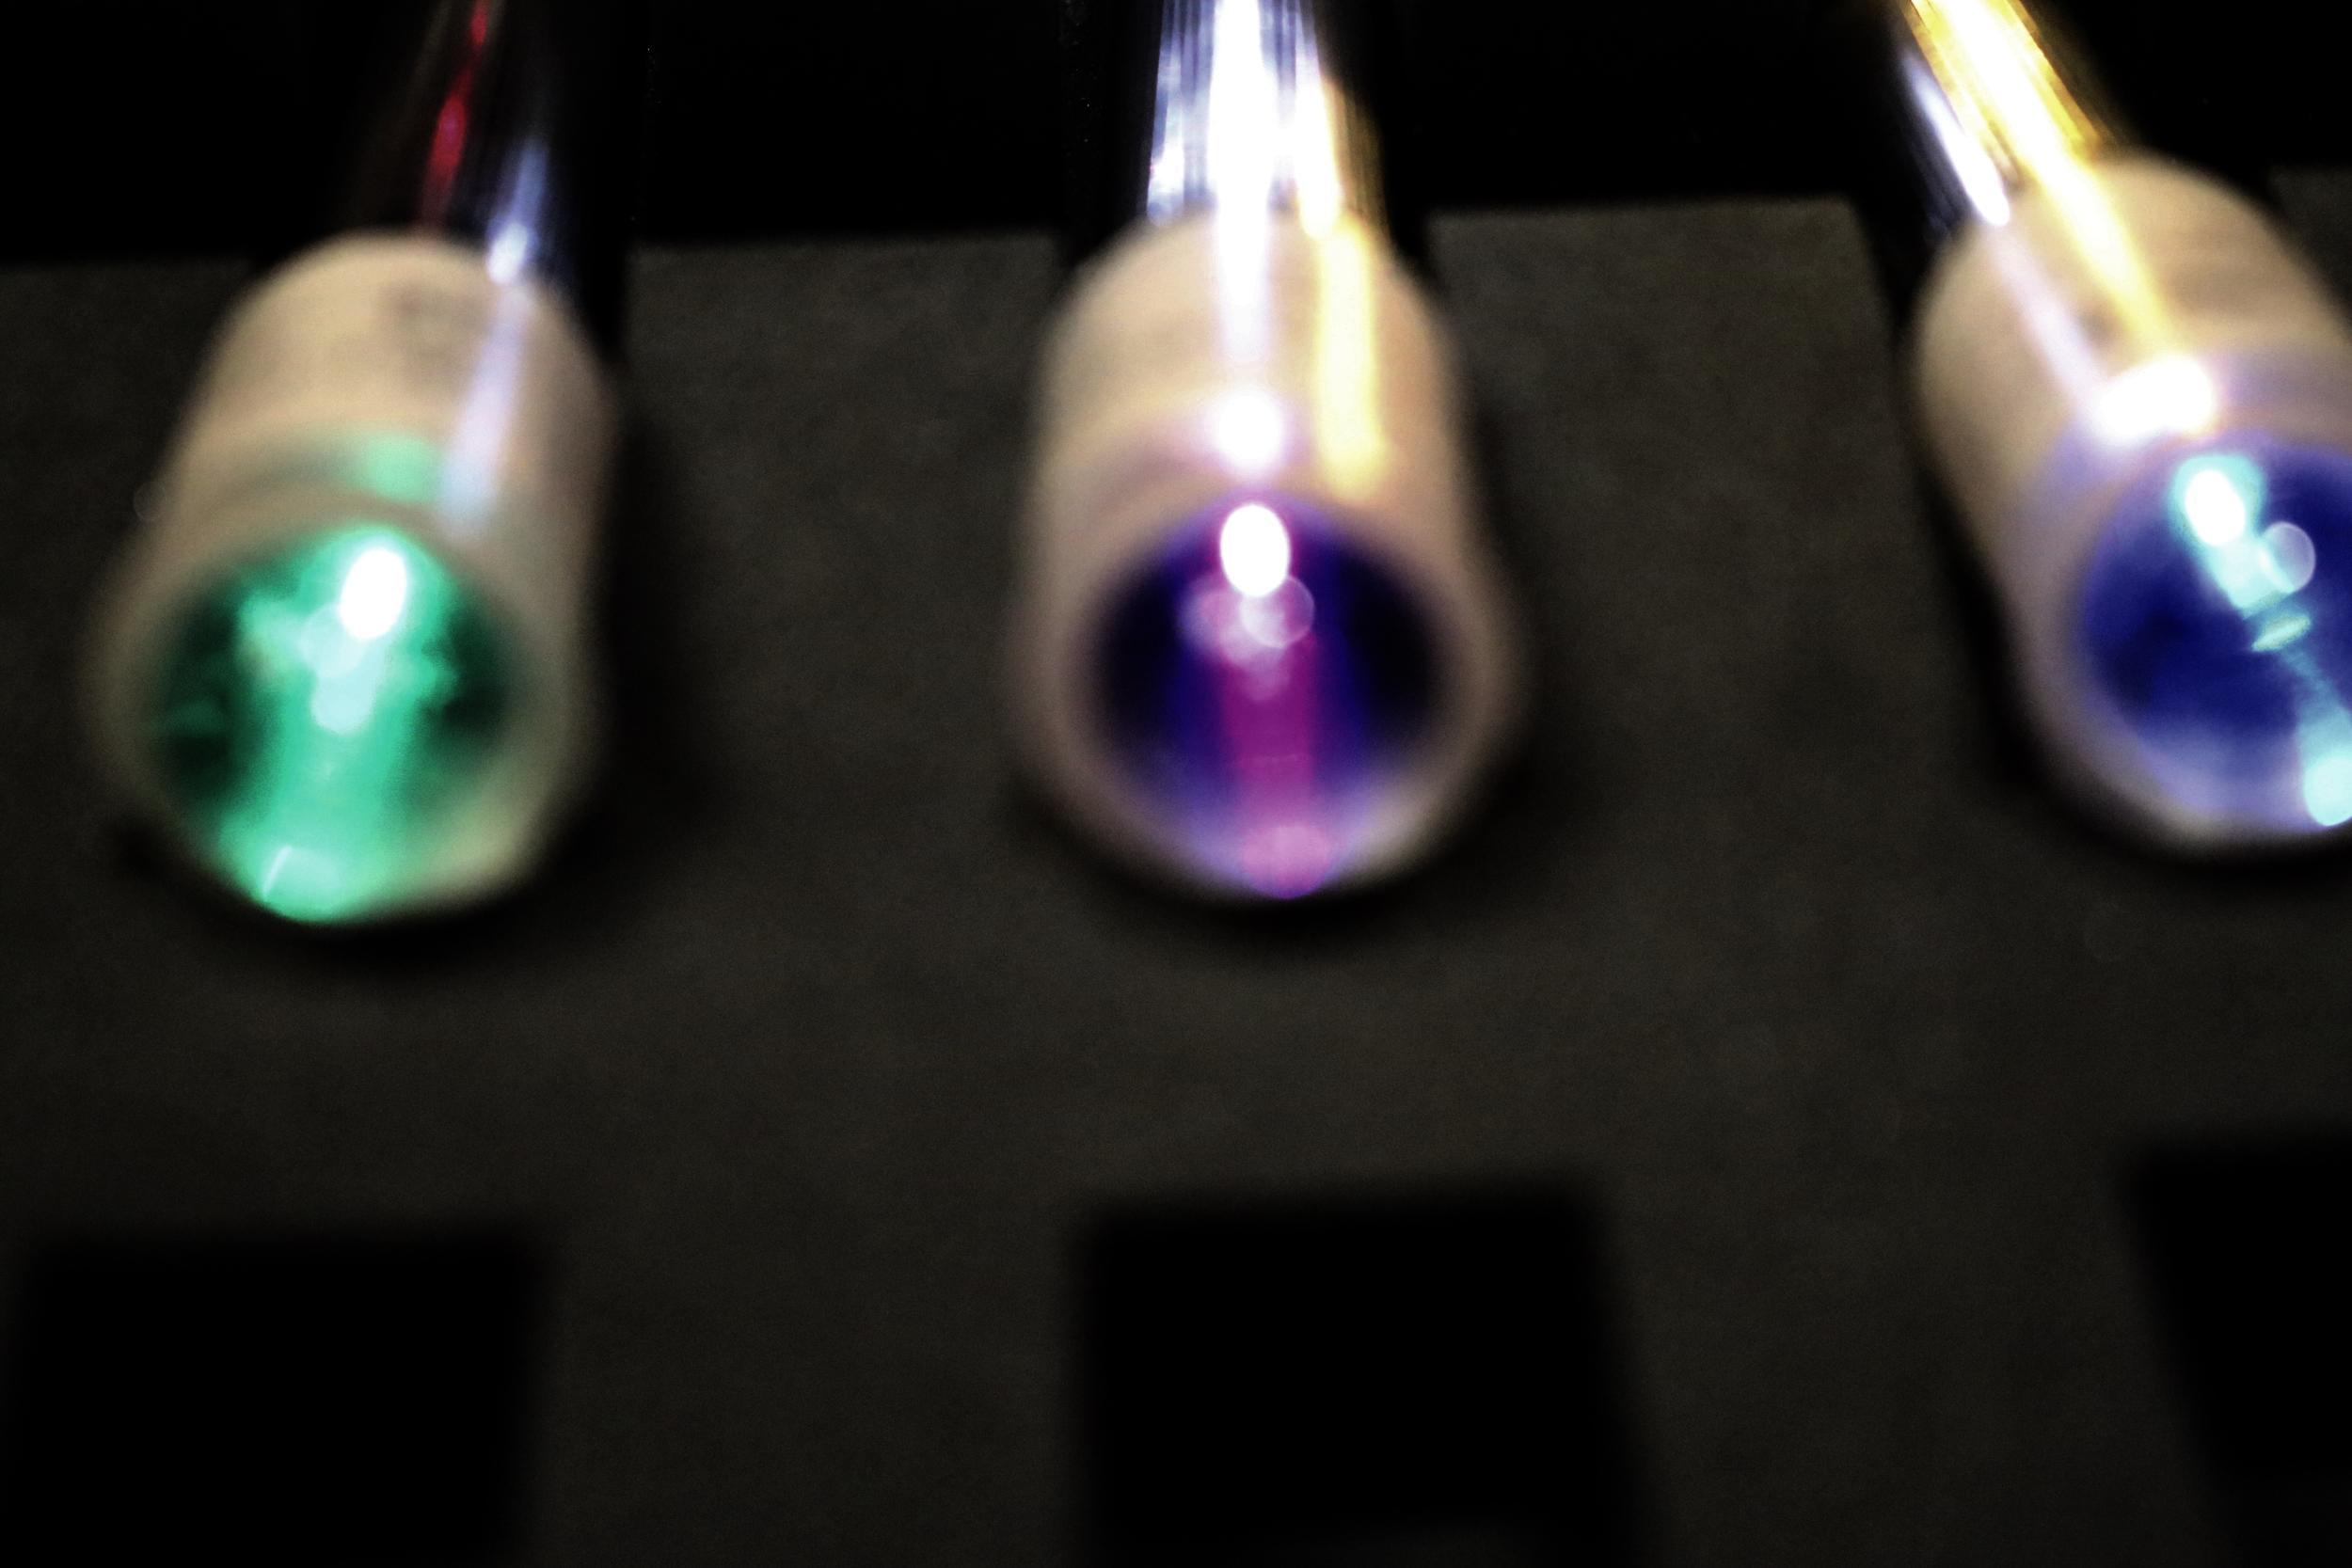 SYntonac Metabolic Syntonic Penlights